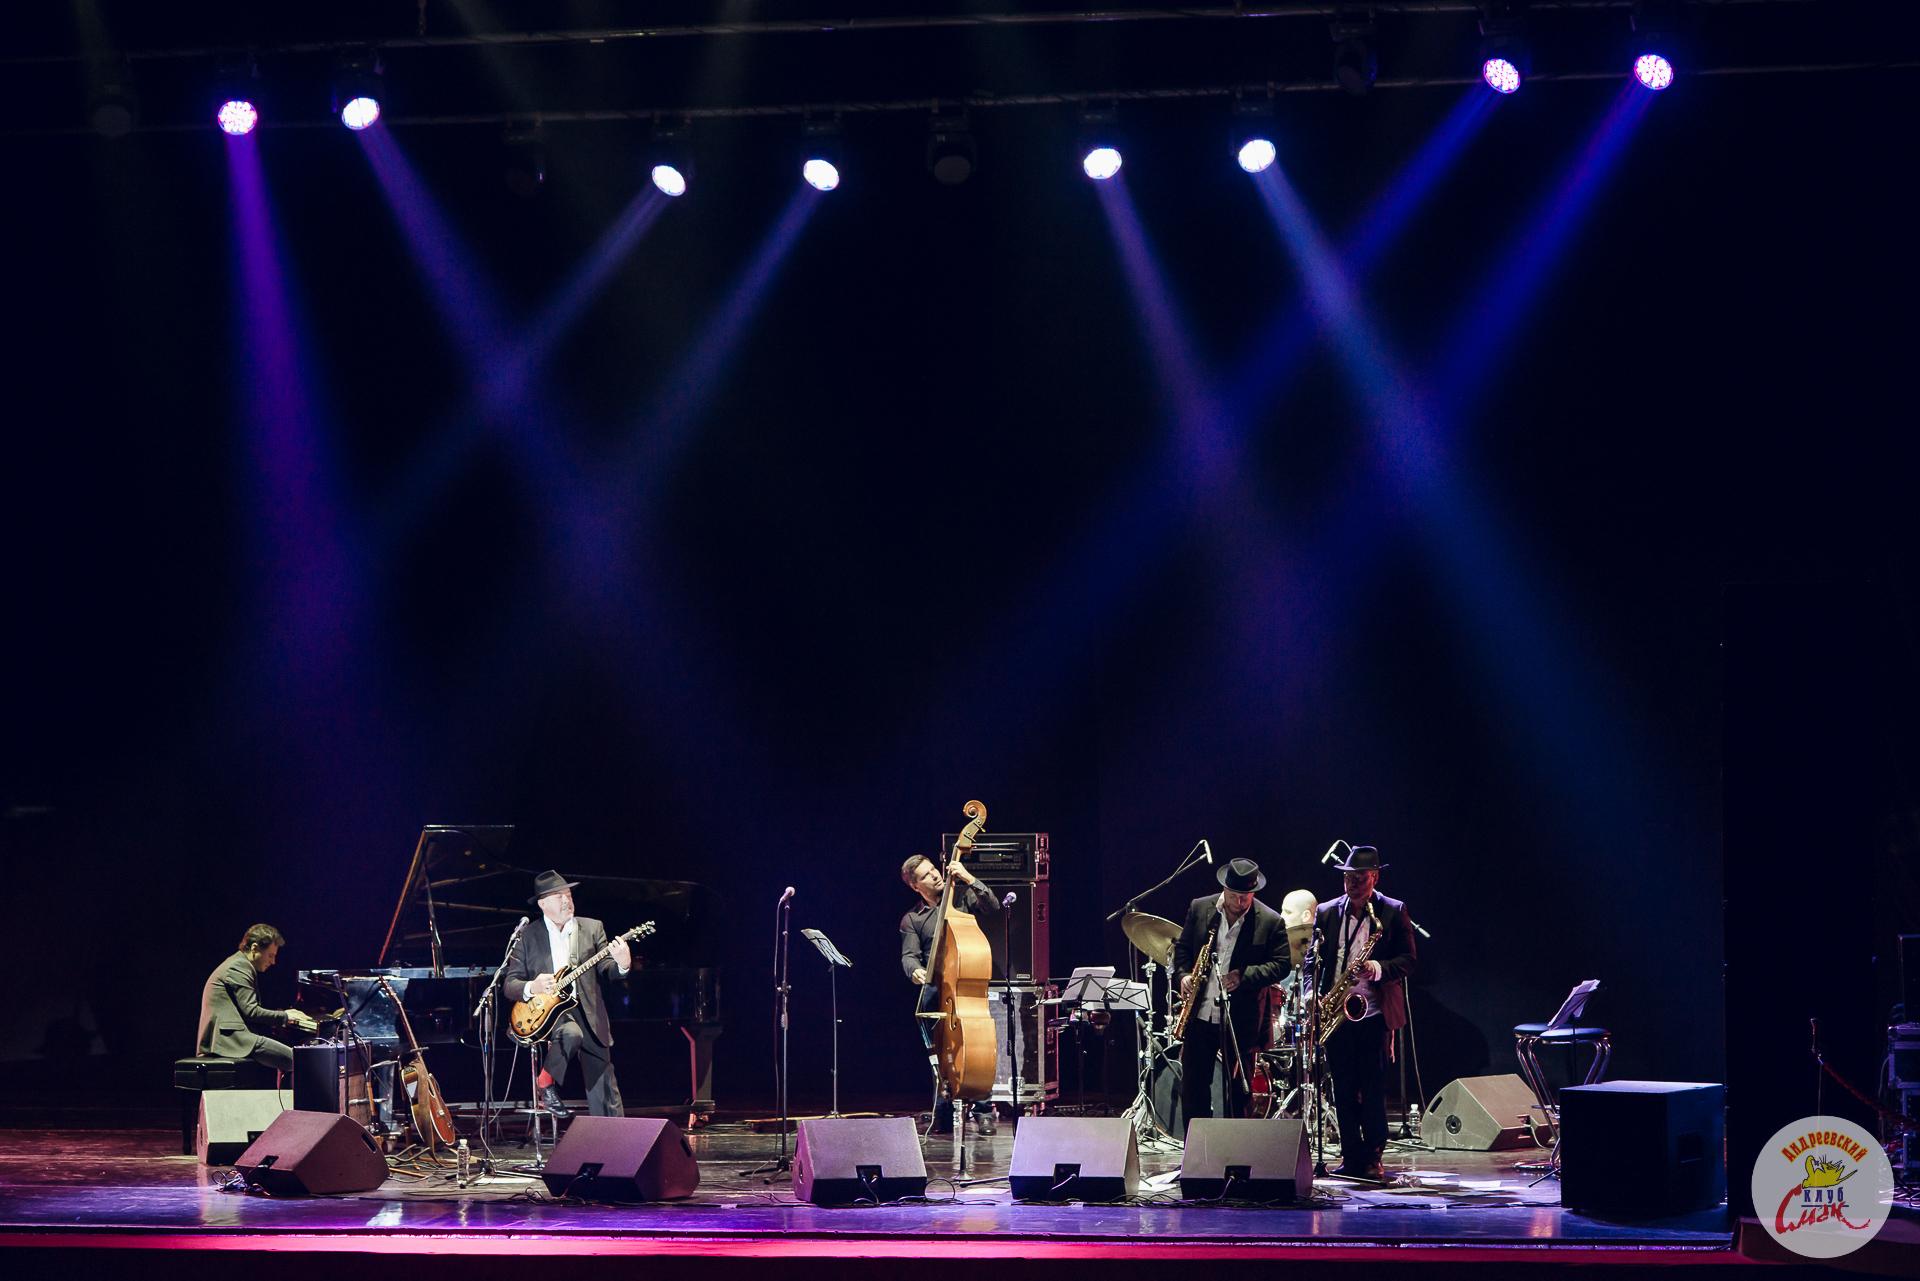 Концерт «Идиш Джаз» и гости Клуба — фотоотчет